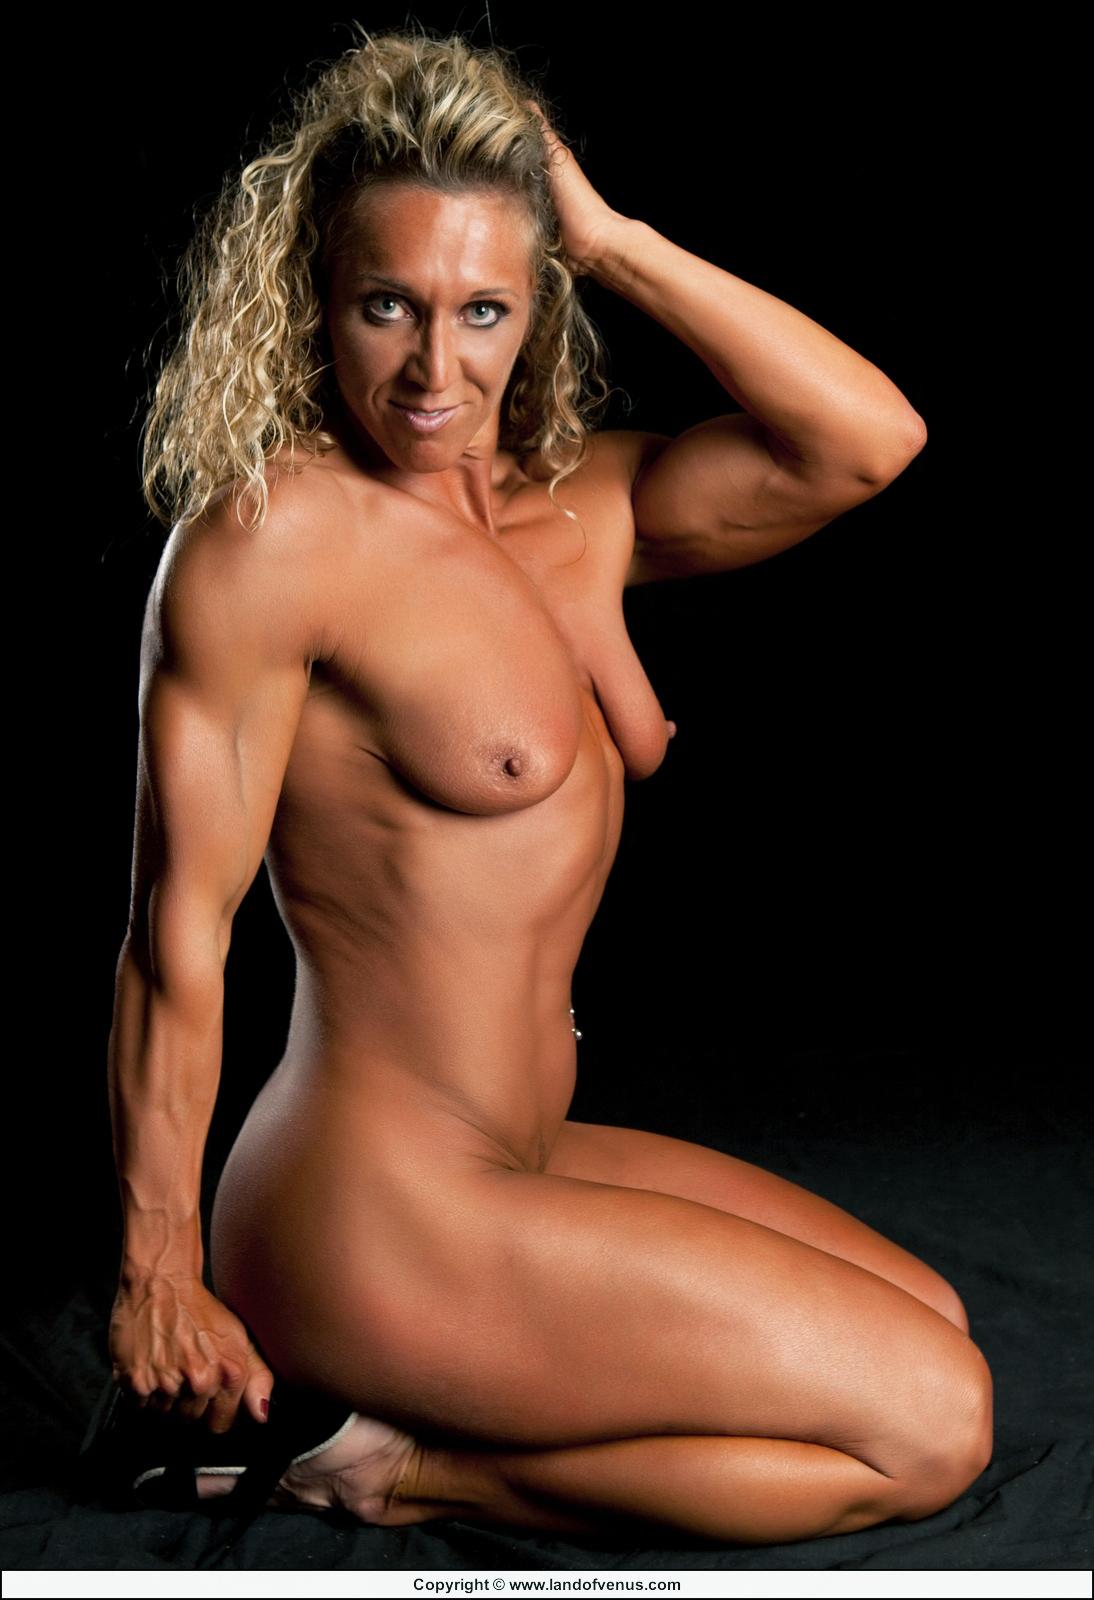 Like Hot nude bodybuilders women think, that